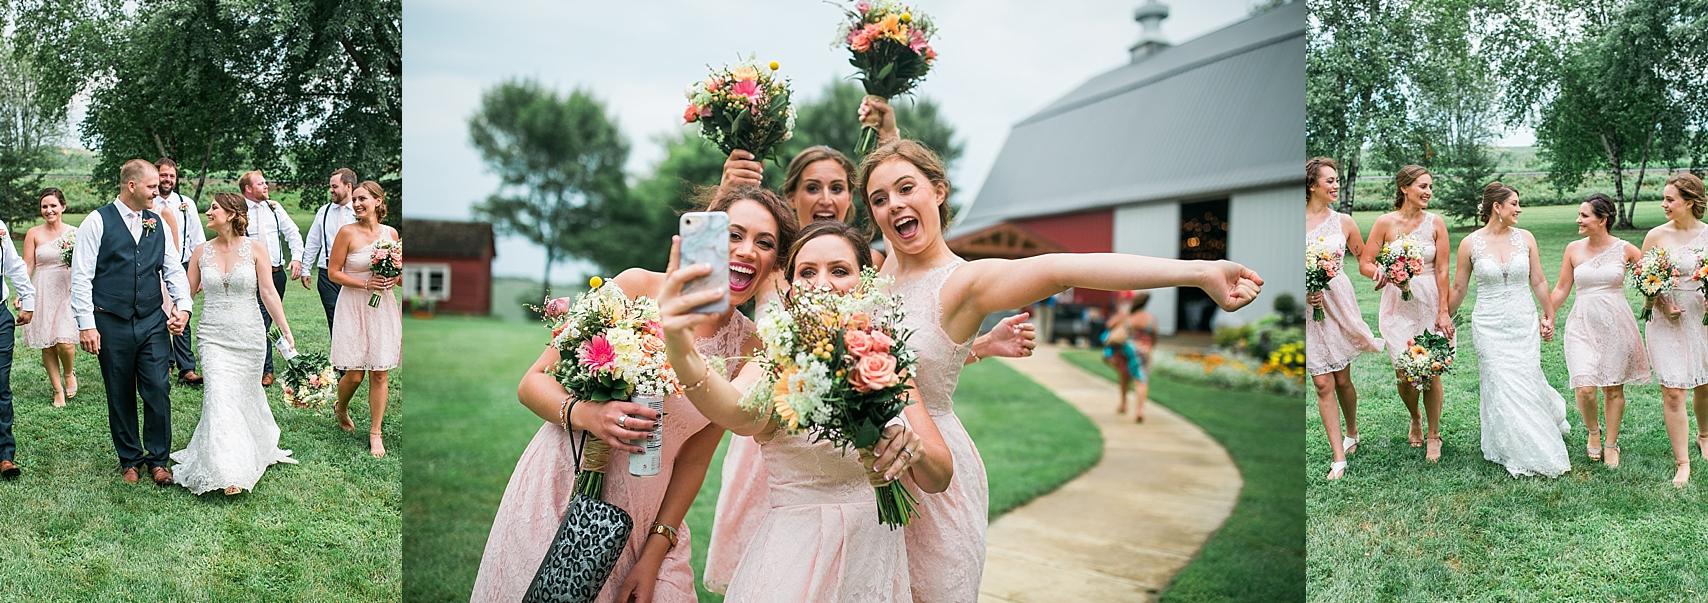 Minnesota Minneapolis Wedding Photographer Best Of 2018 Weddings Mallory Kiesow Photography_0021.jpg